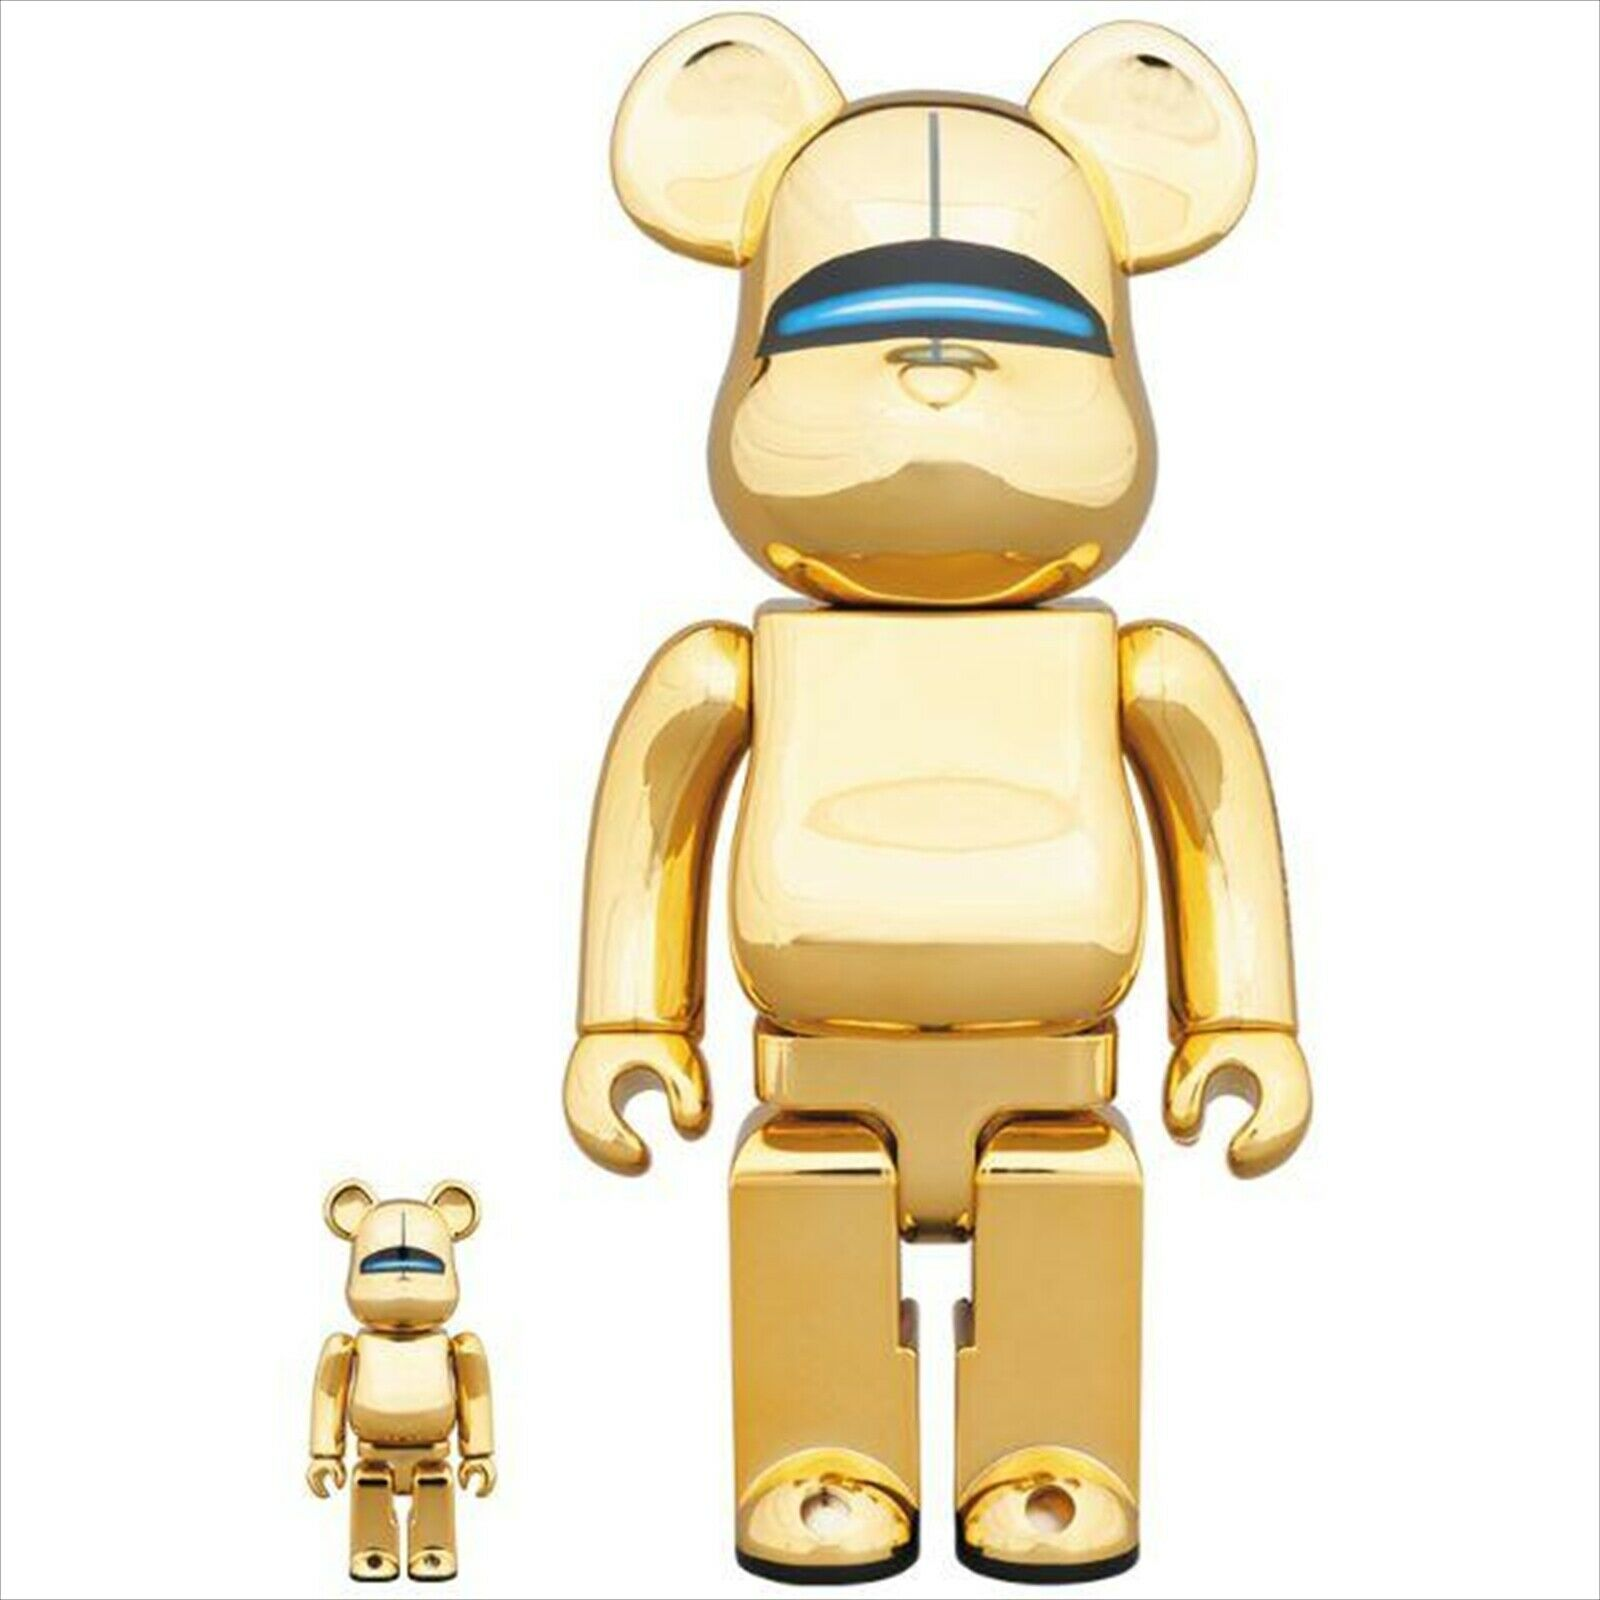 BE@RBRICK 400% & 100% Sorarama gold gold Medicom Toy Figure